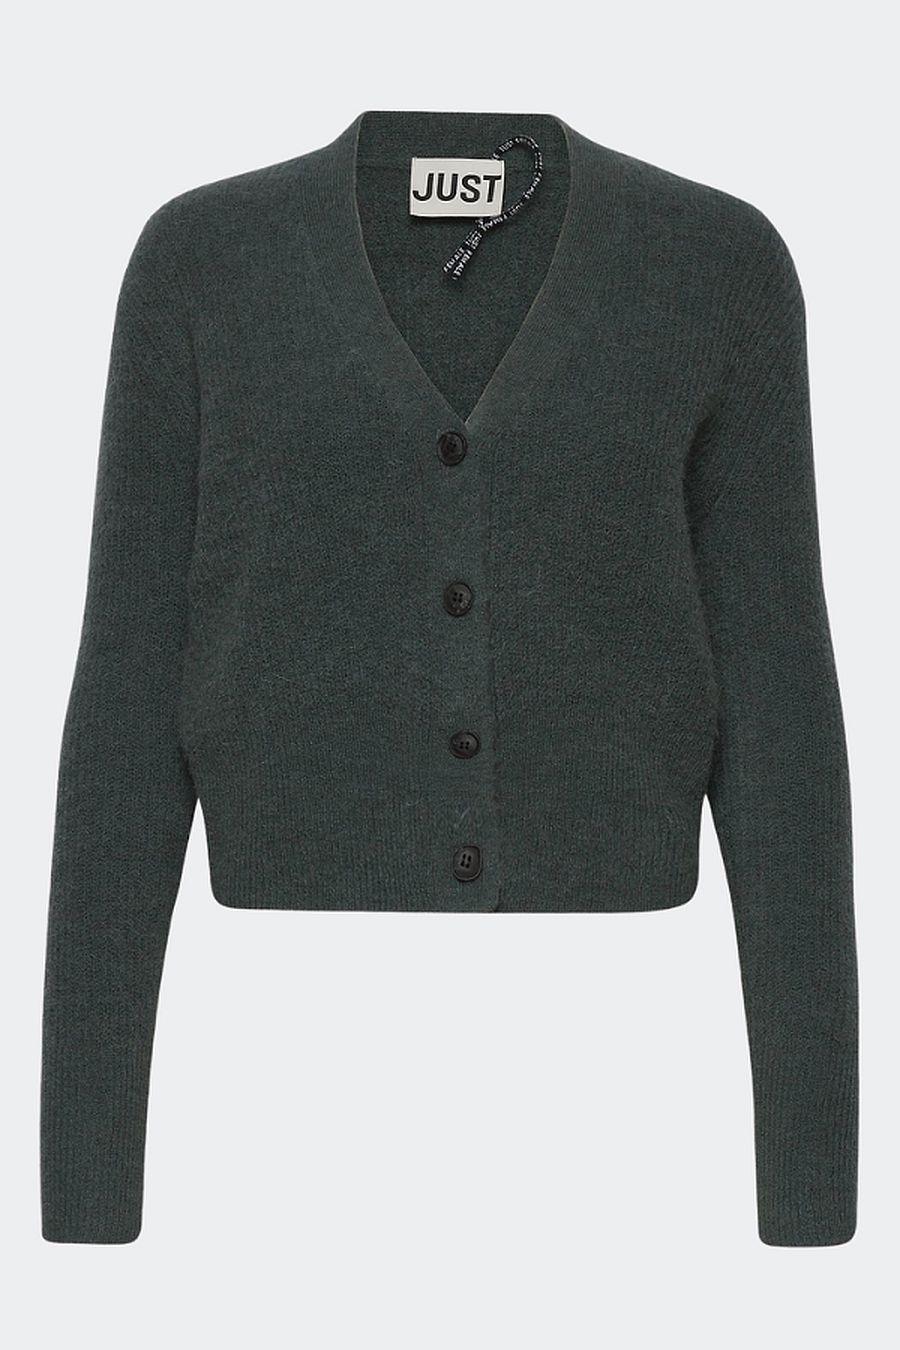 Just Female Rebelo Knit Cardigan - Balsam Green